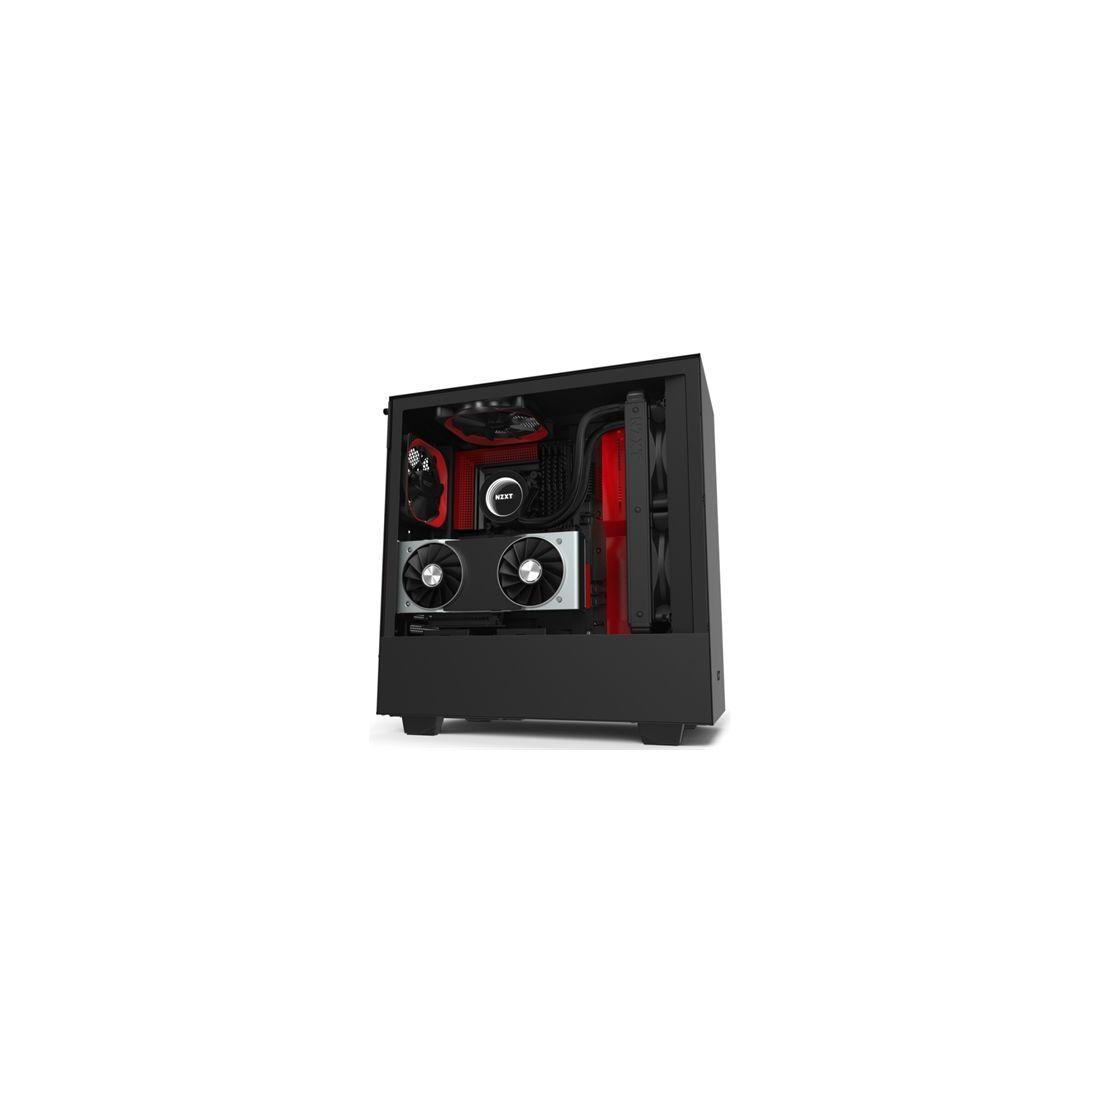 NZXT Caja SemiTorre H510i Led RGB Negro Rojo